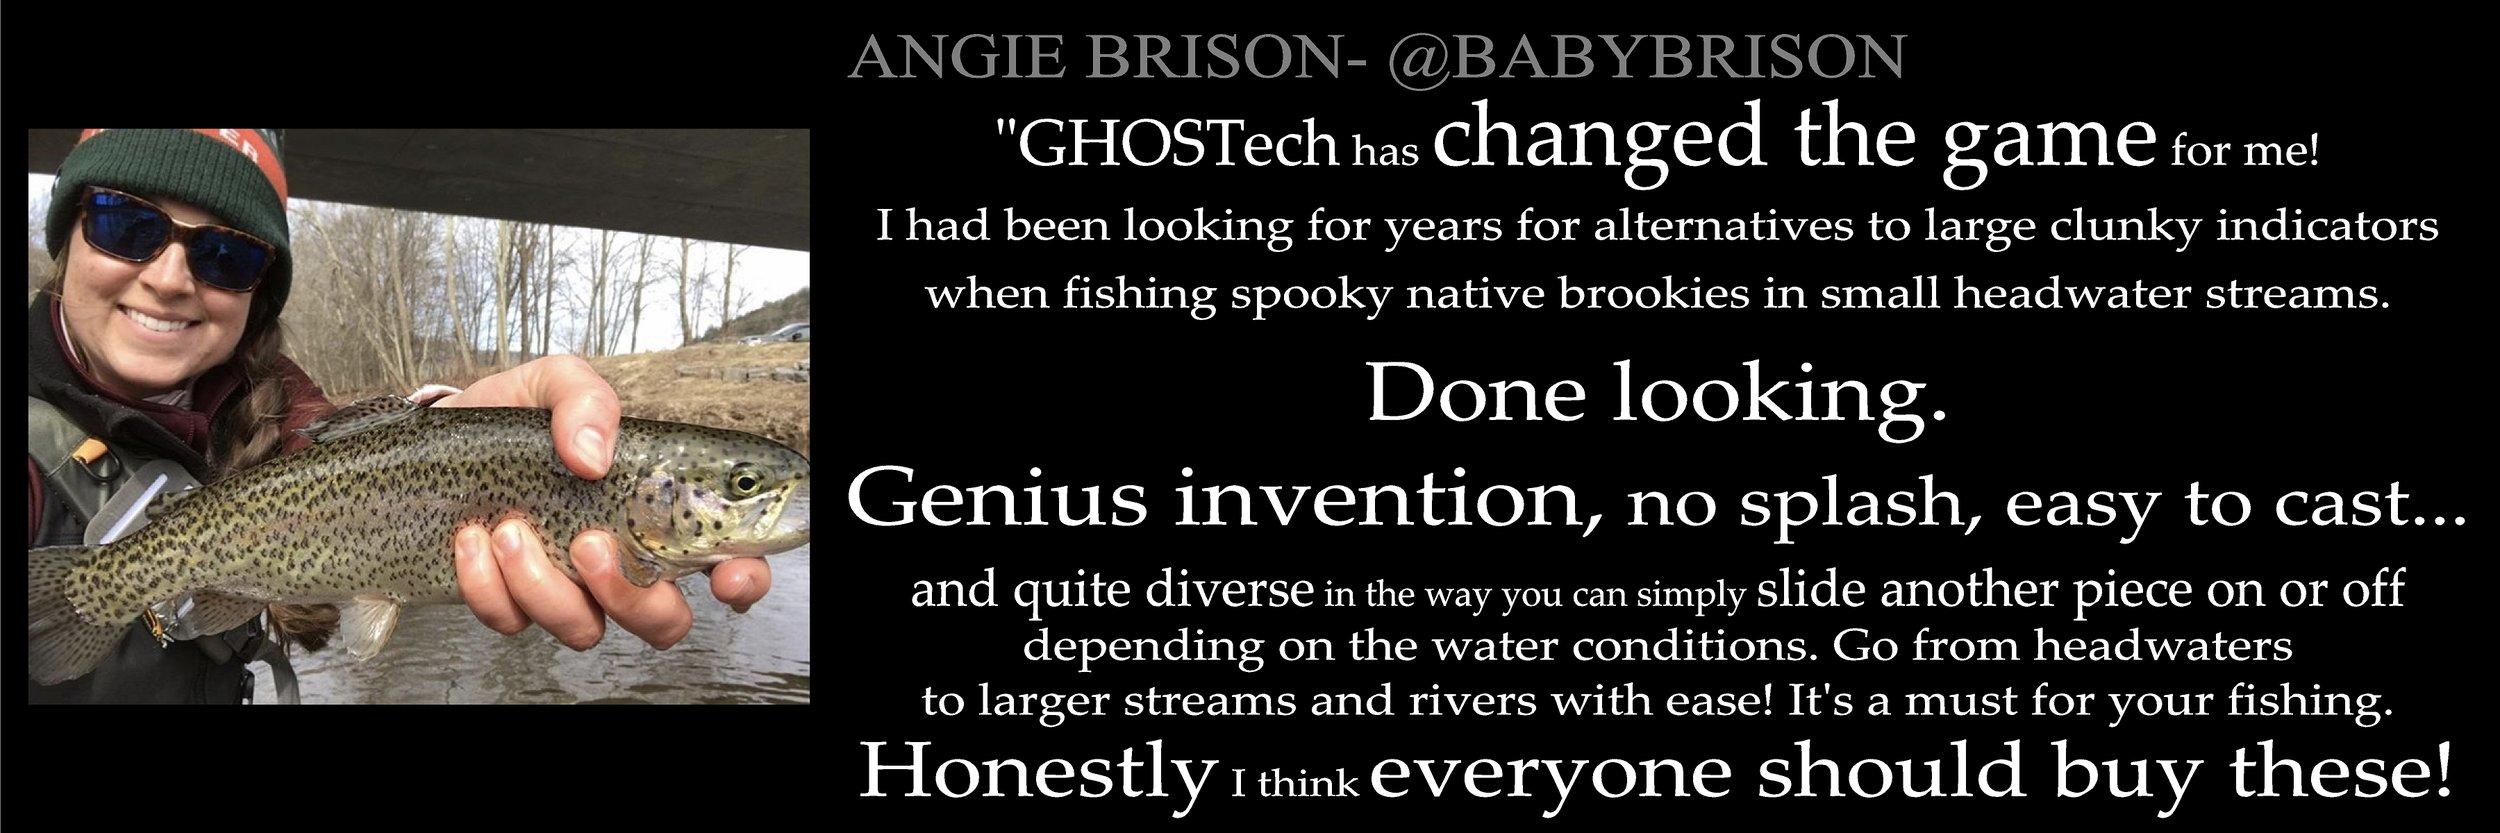 Ghostech testimonial rotator_06242019_Angie Brison.jpg